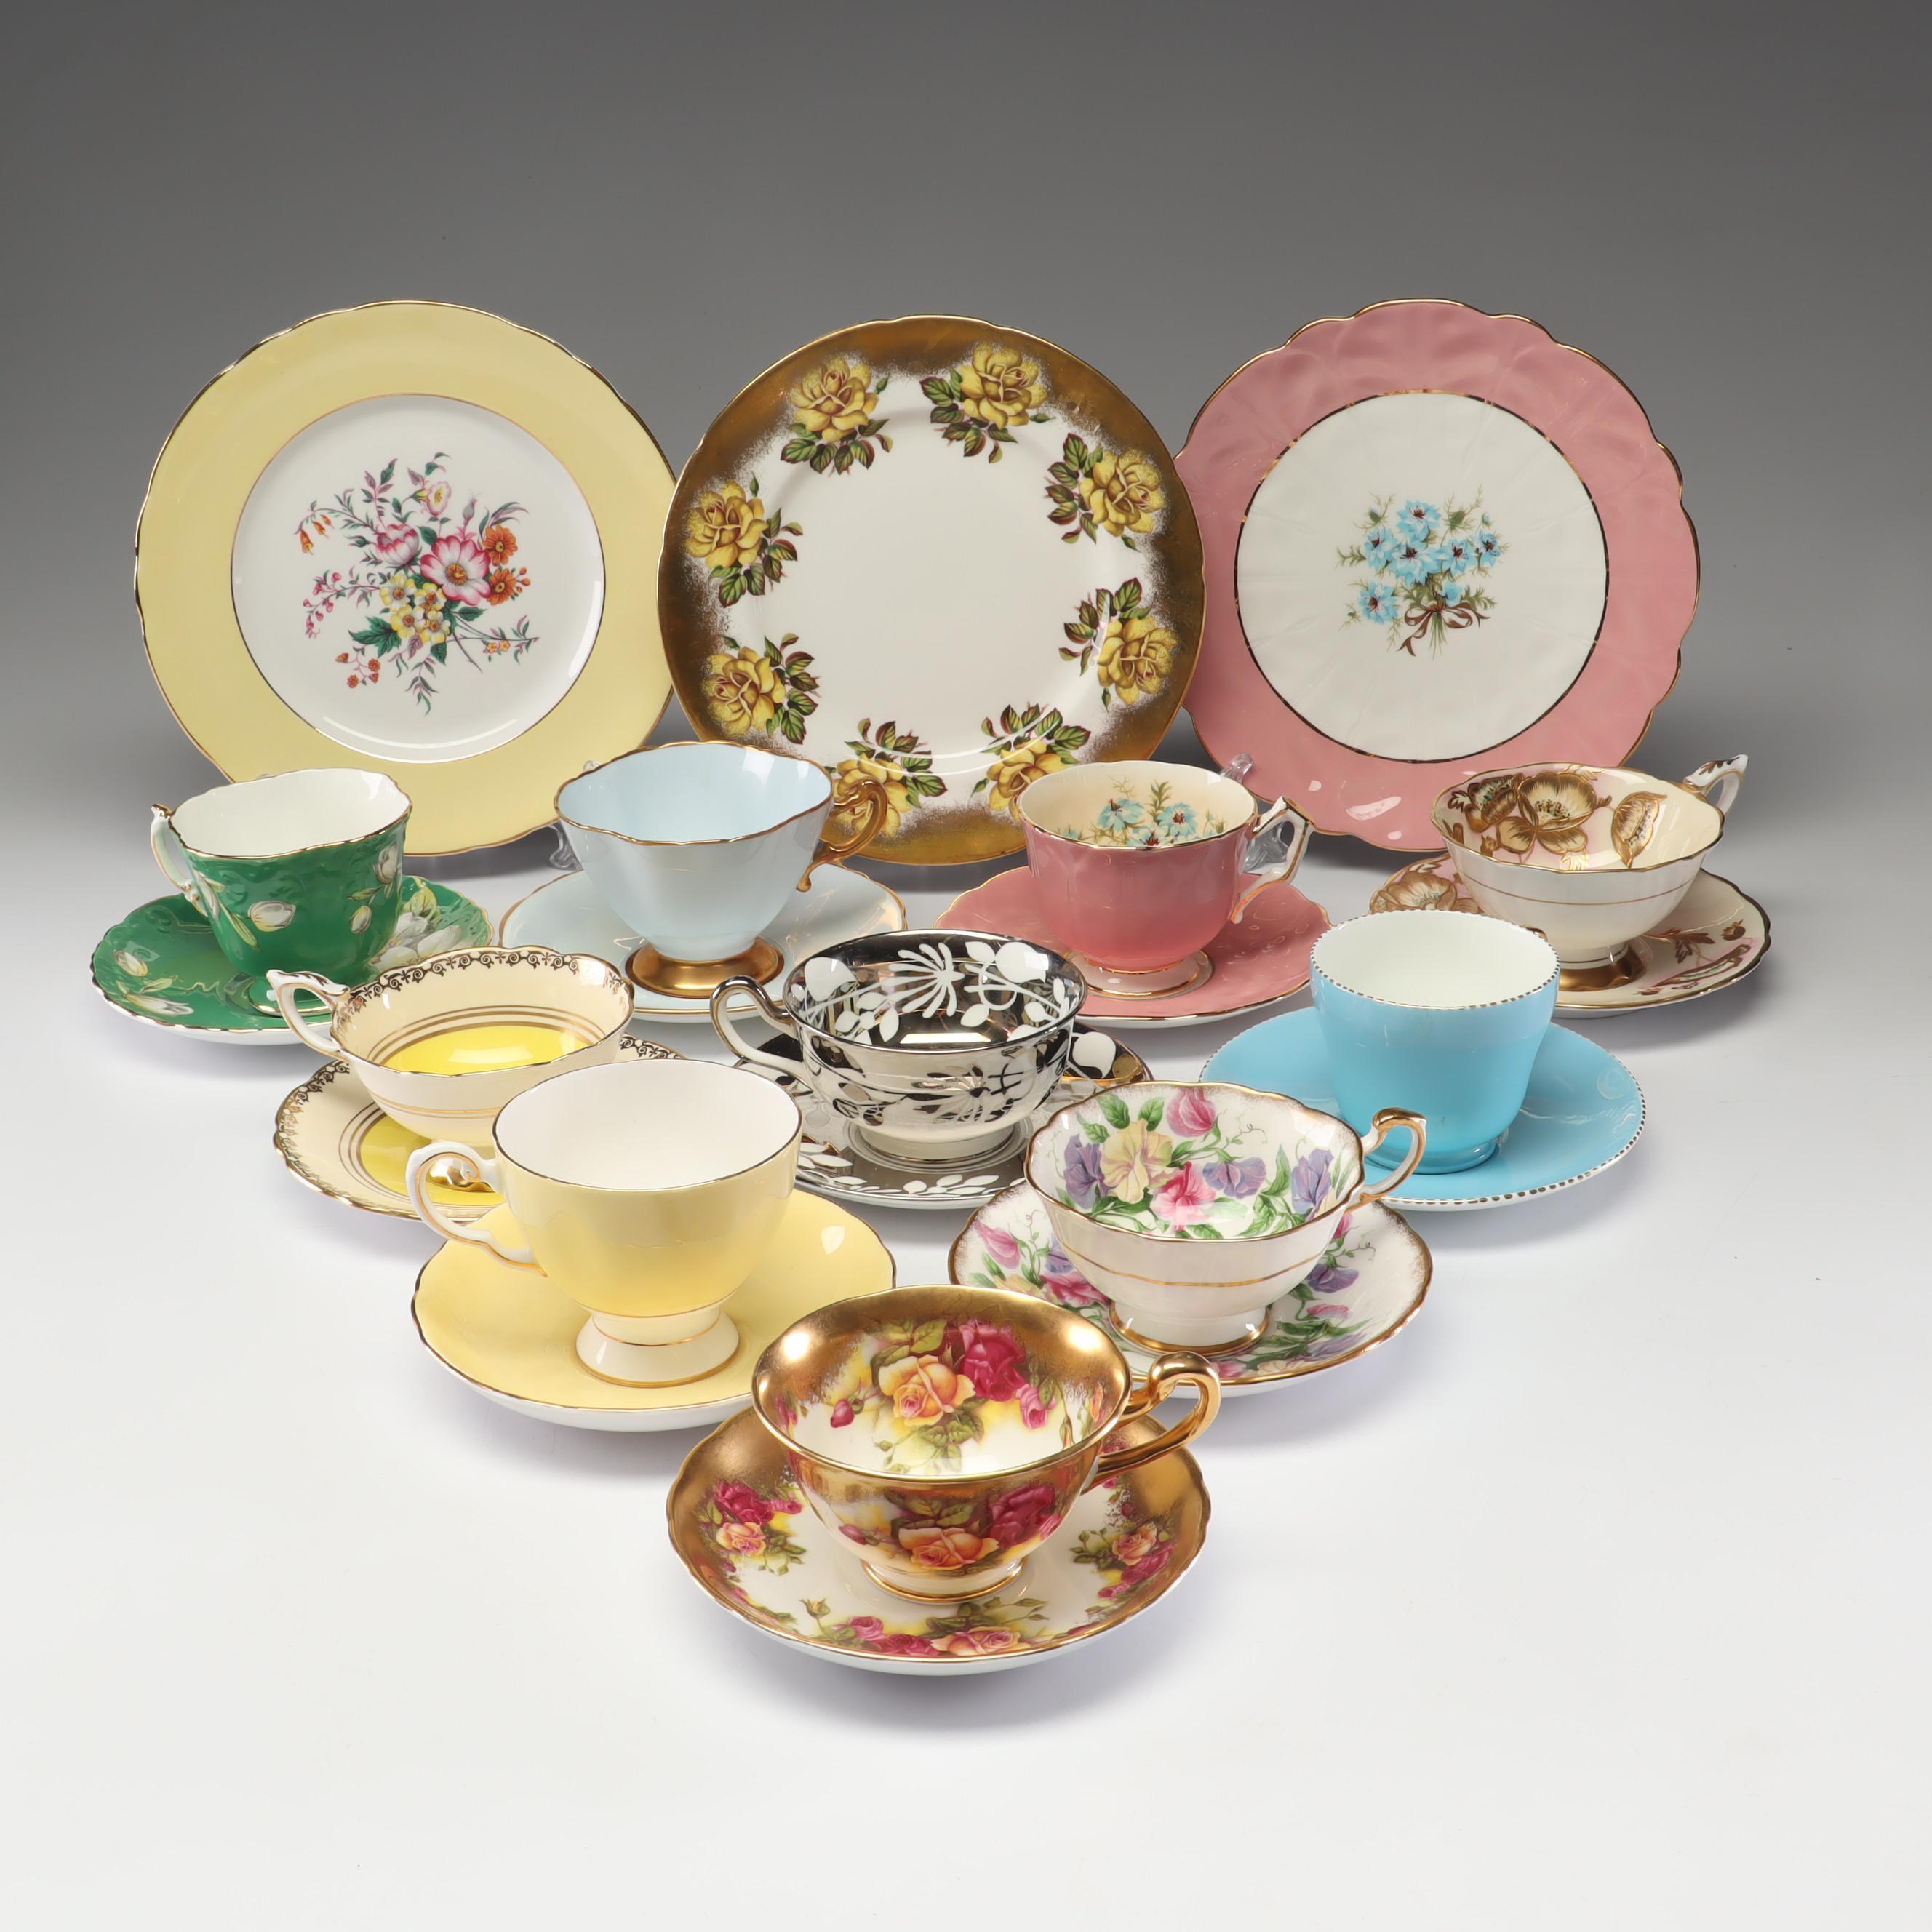 Collection of English Bone China Tea Settings